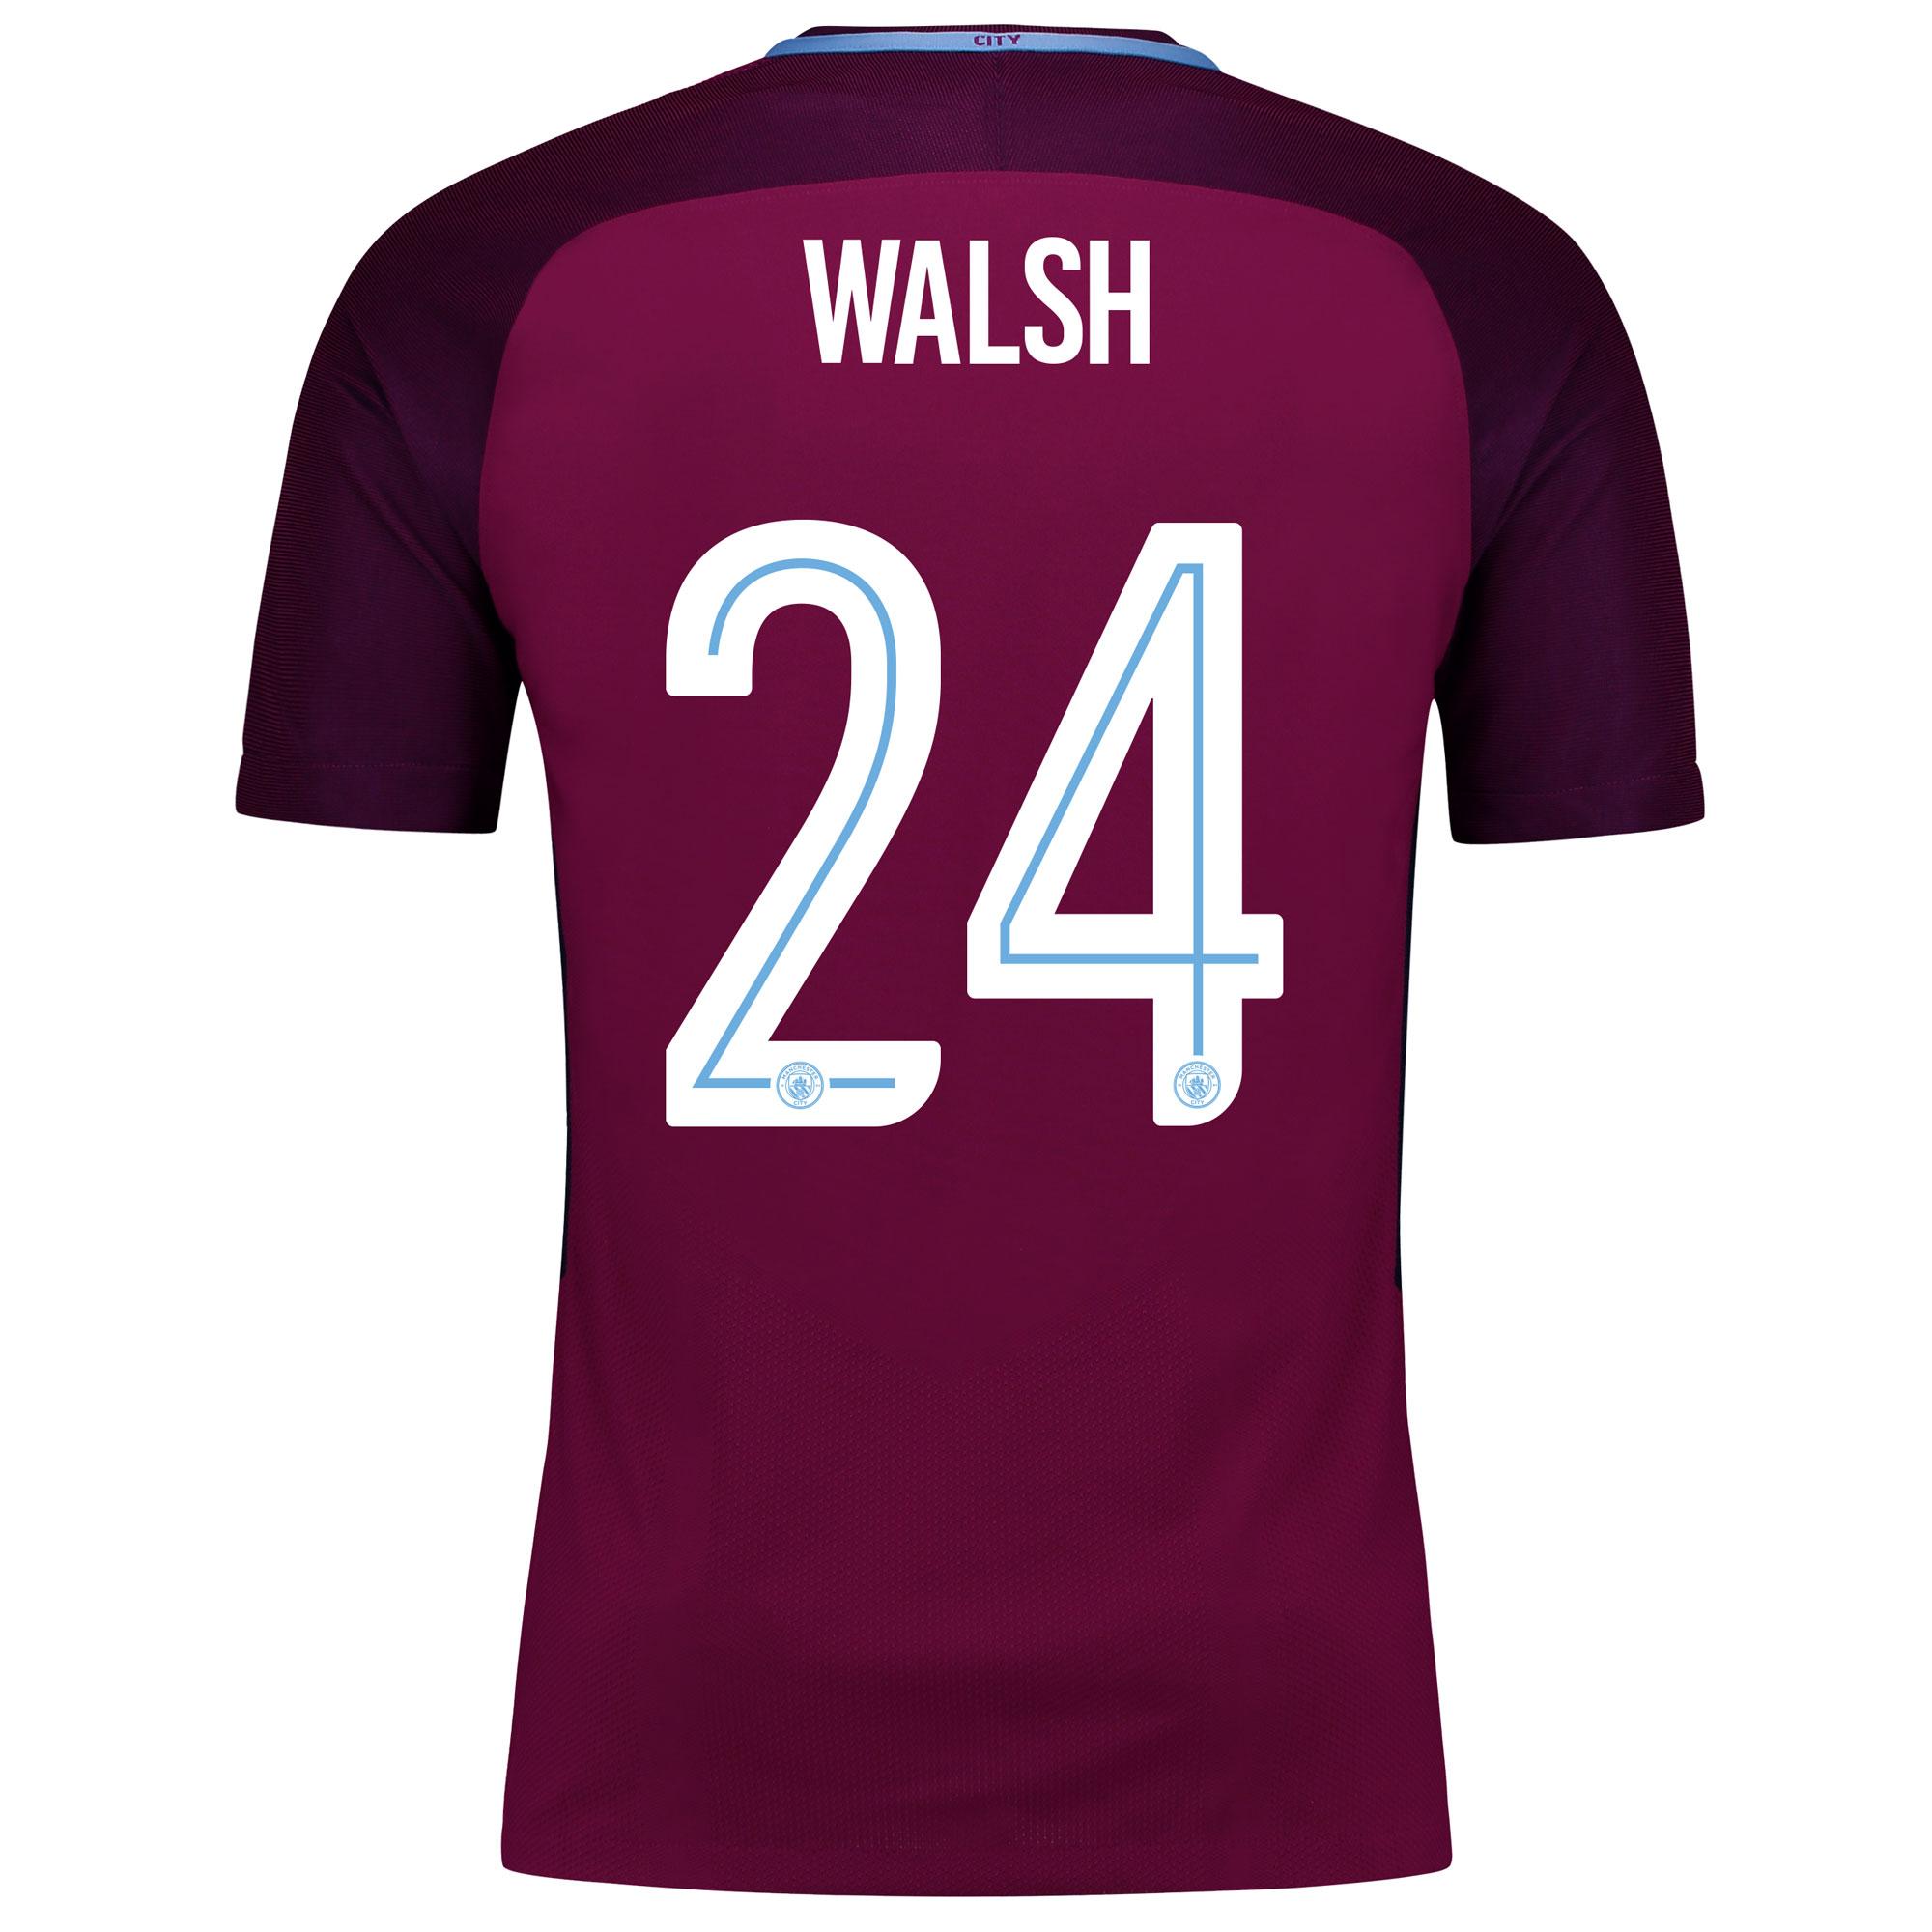 Manchester City Away Vapor Match Cup Shirt 2017-18 with Walsh 24 print